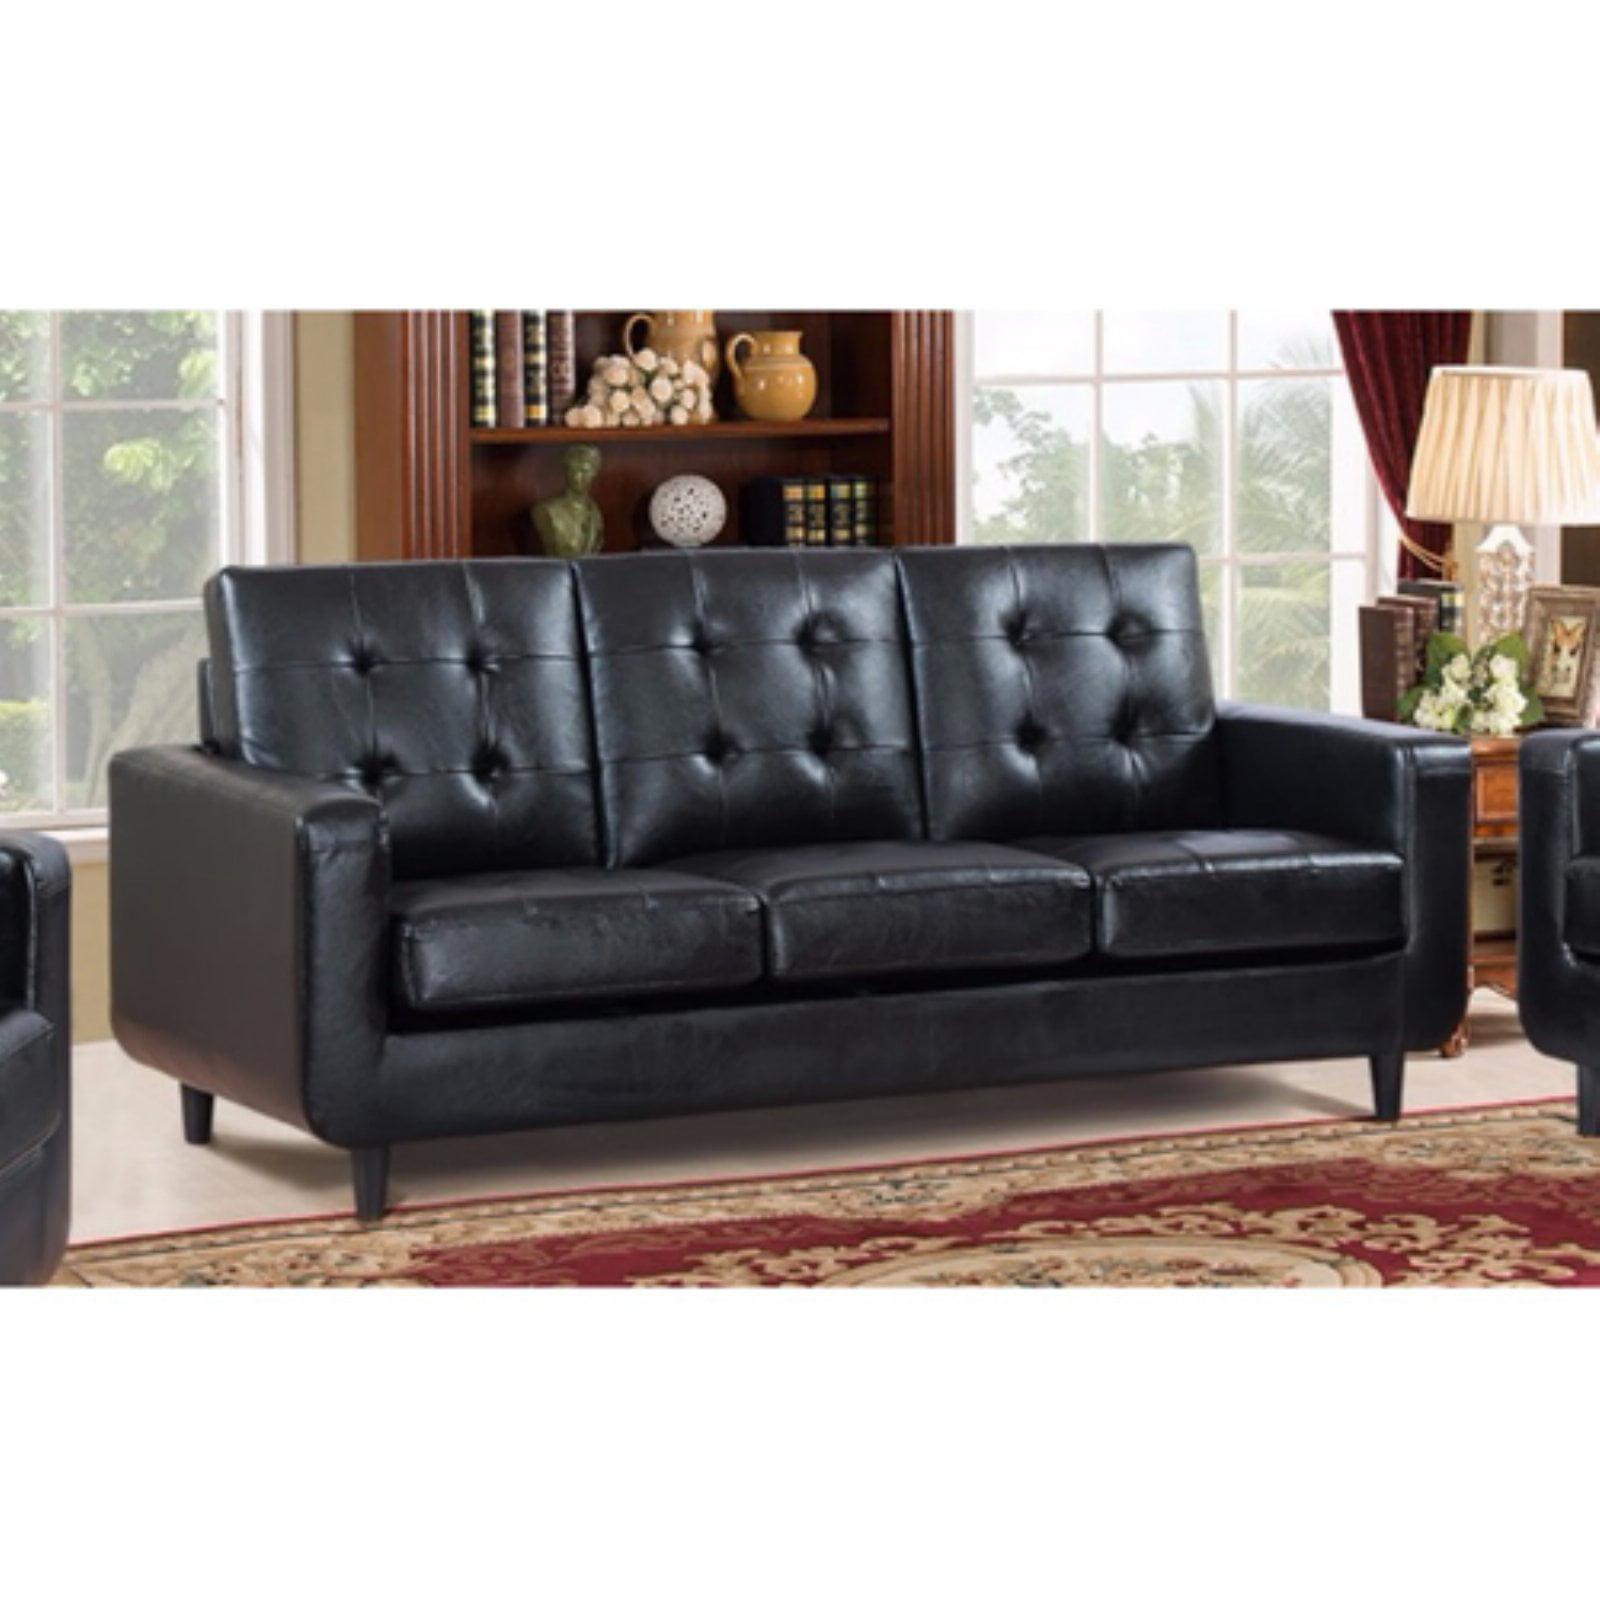 Comfortable black finish sofa with velvety cushion walmart com